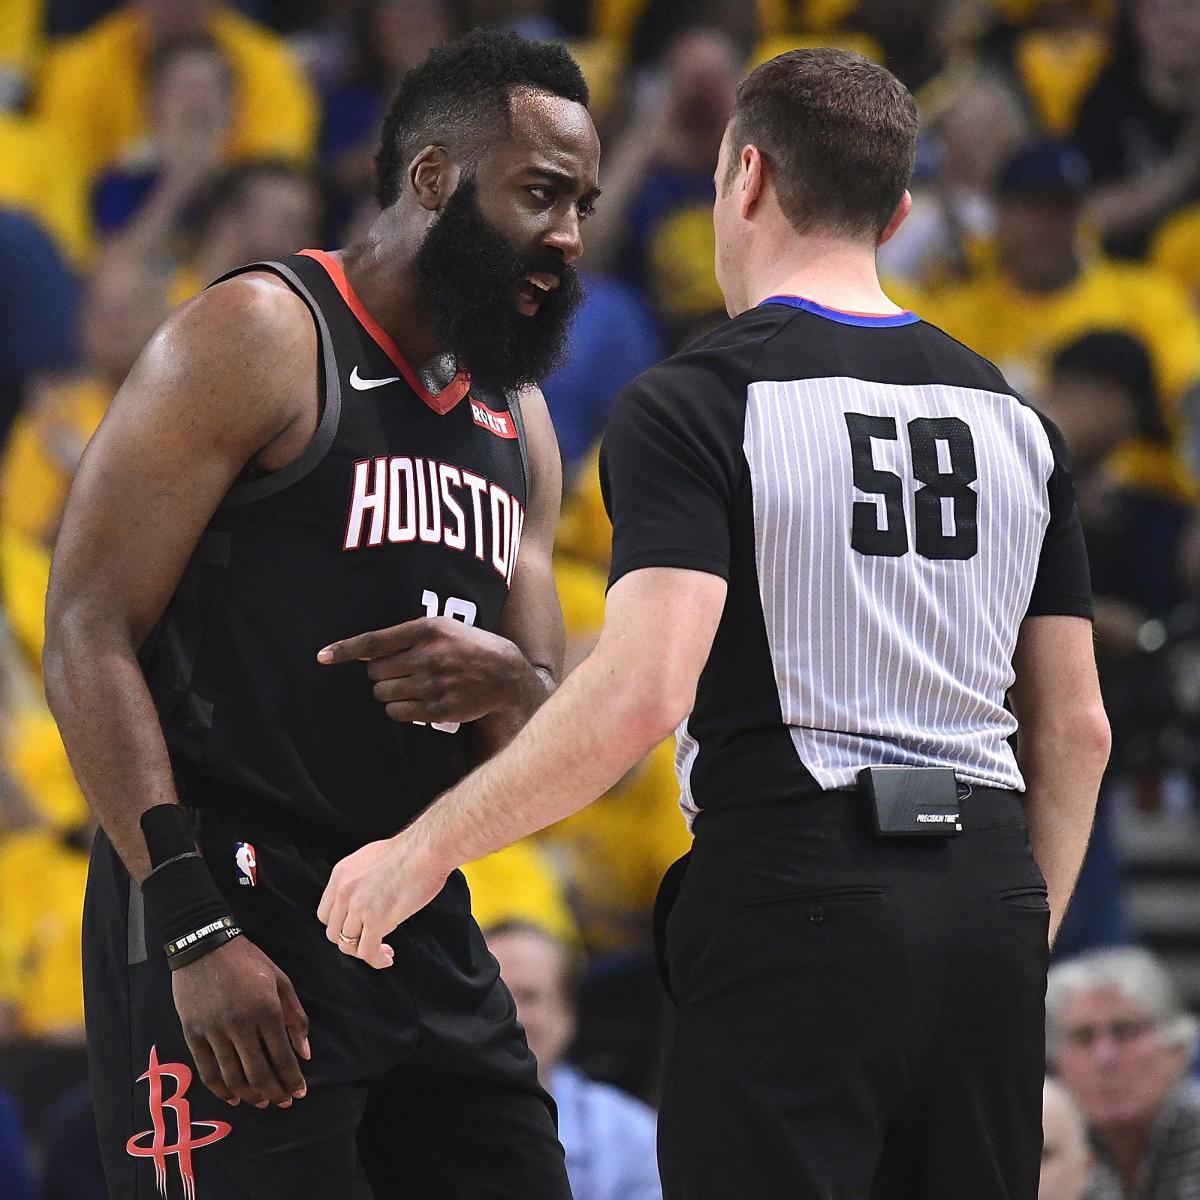 Rockets Vs Warriors May 24: Should Harden, Rockets Change Approach After No-Calls Vs